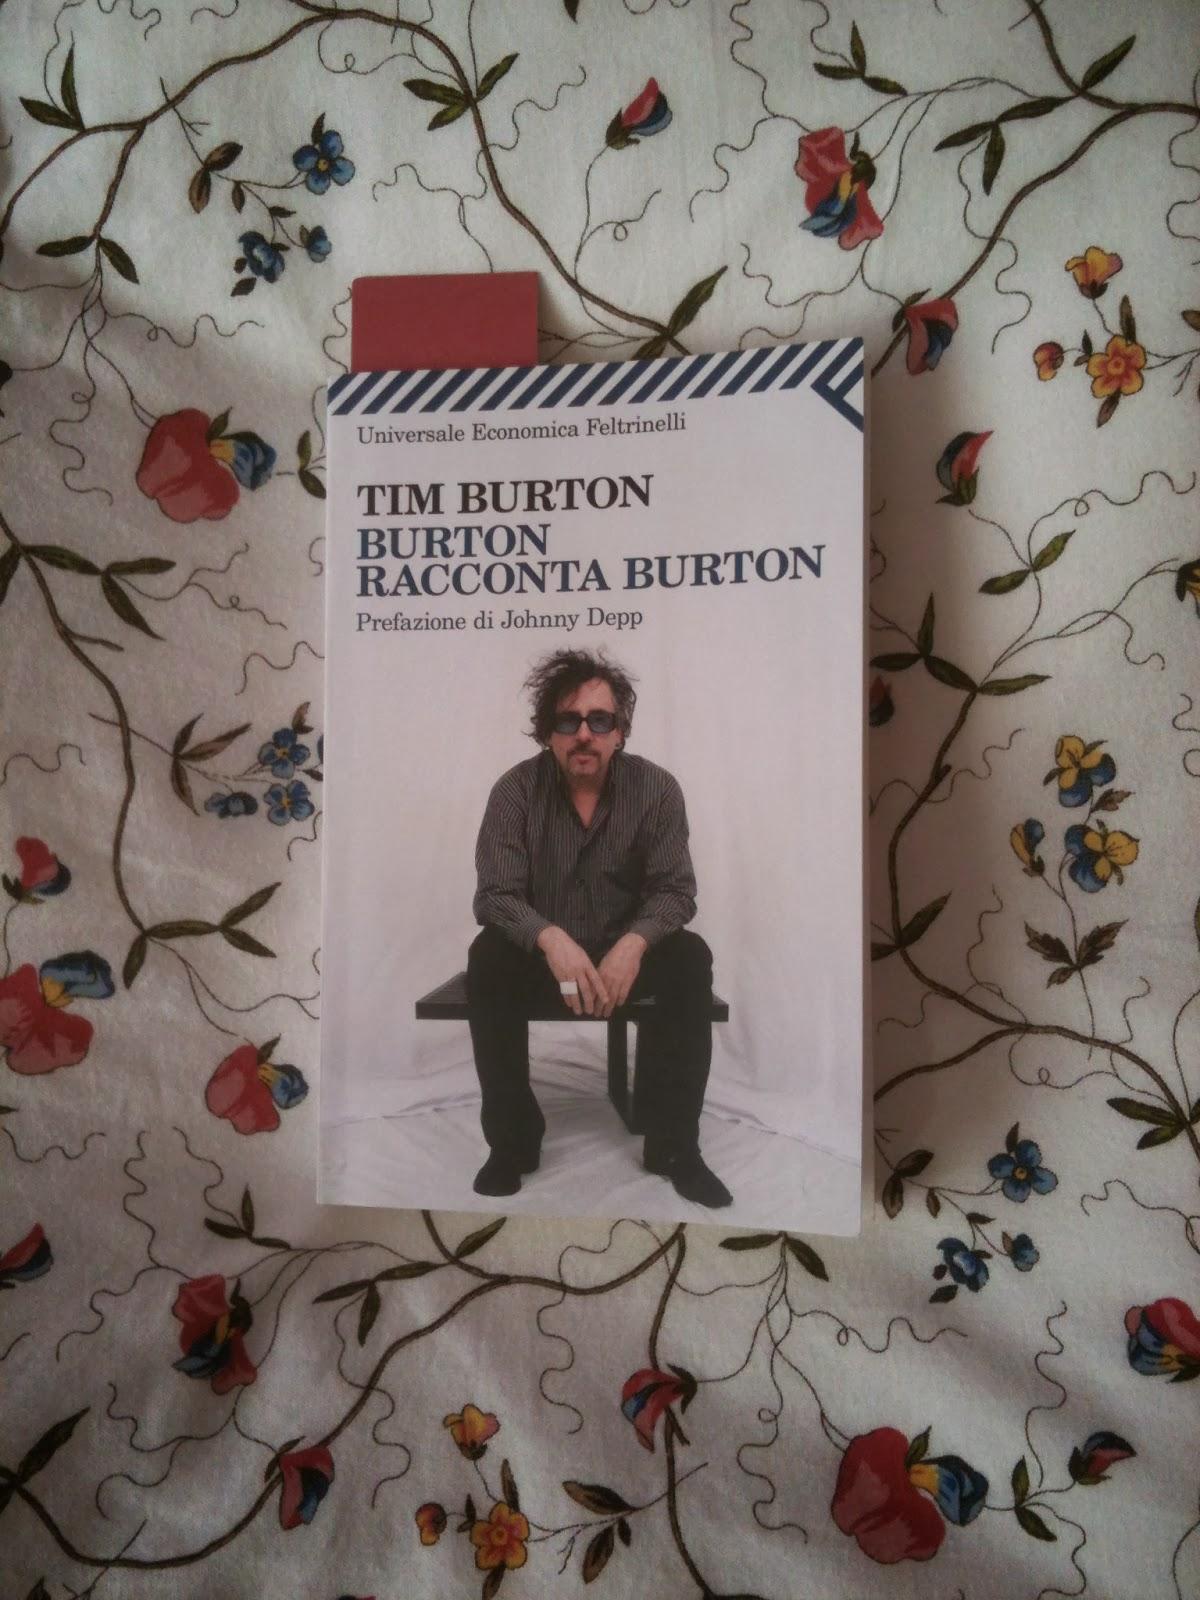 burton racconta burton  Burton racconta Burton - Tim Burton